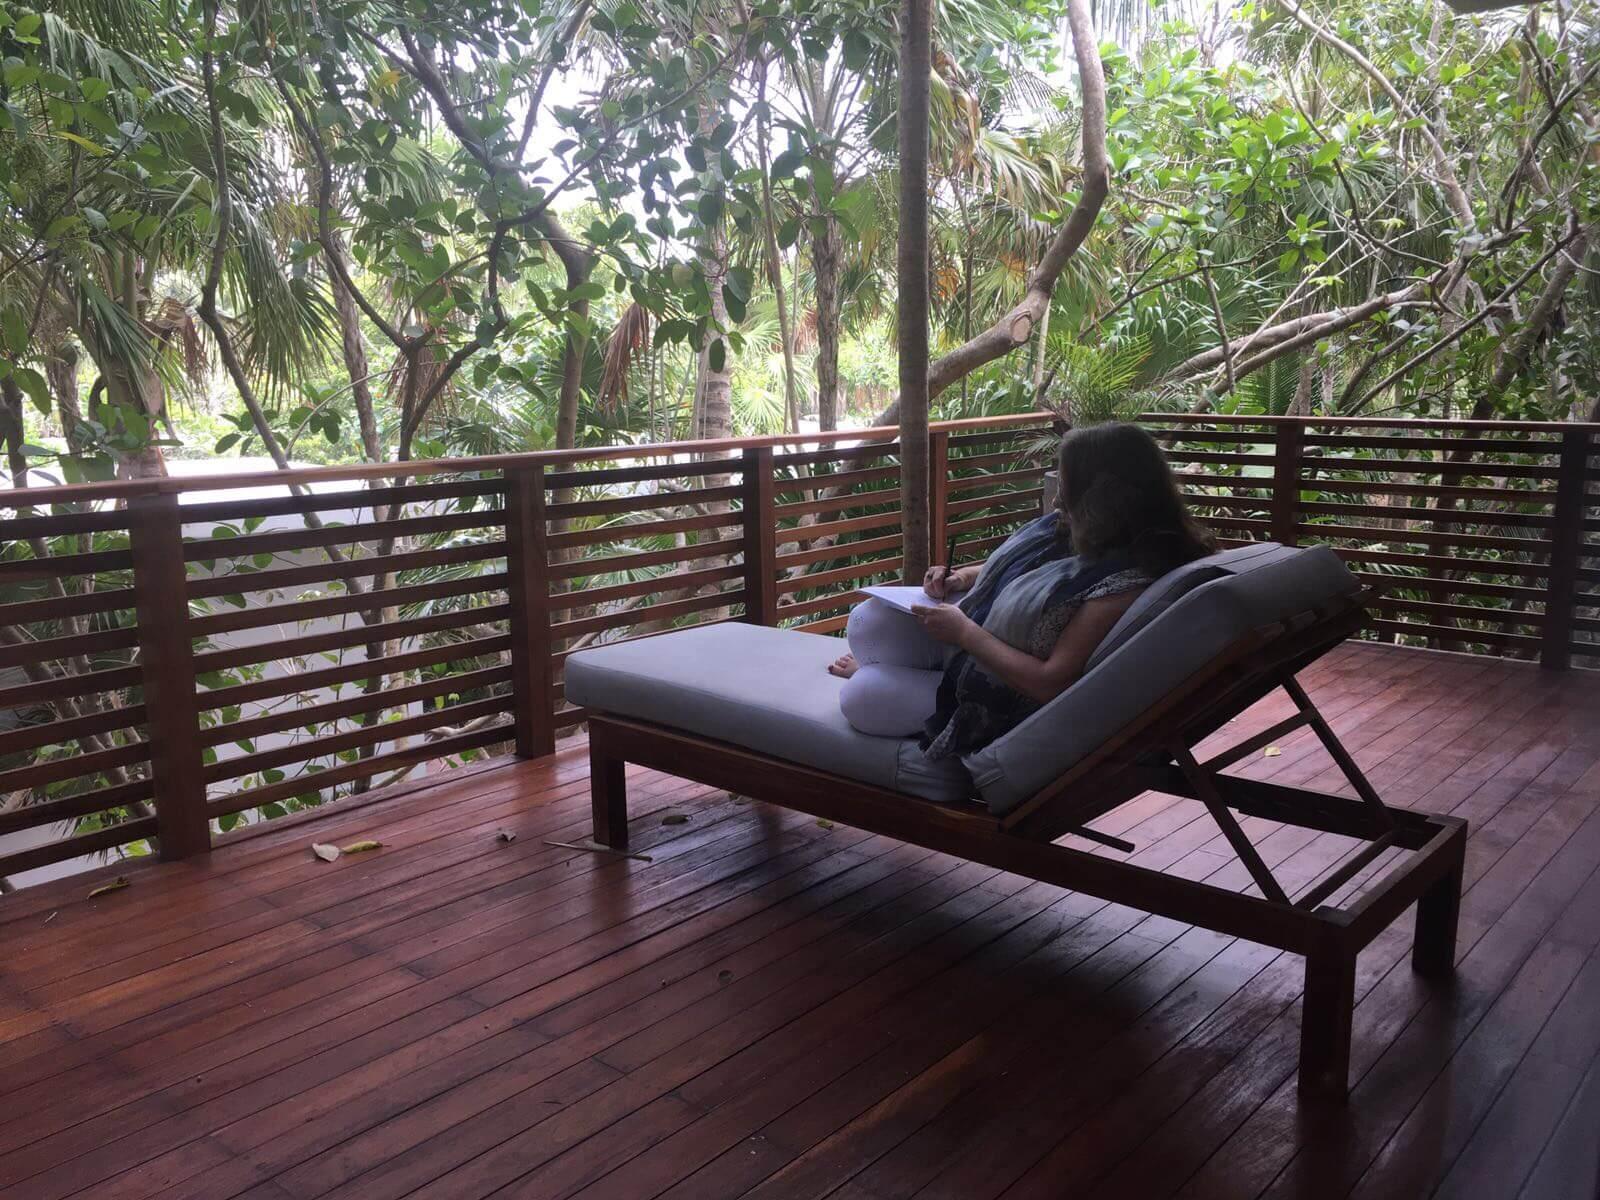 Tulum April 2017 - Apr 29, 5 34 02 PM-215.jpg